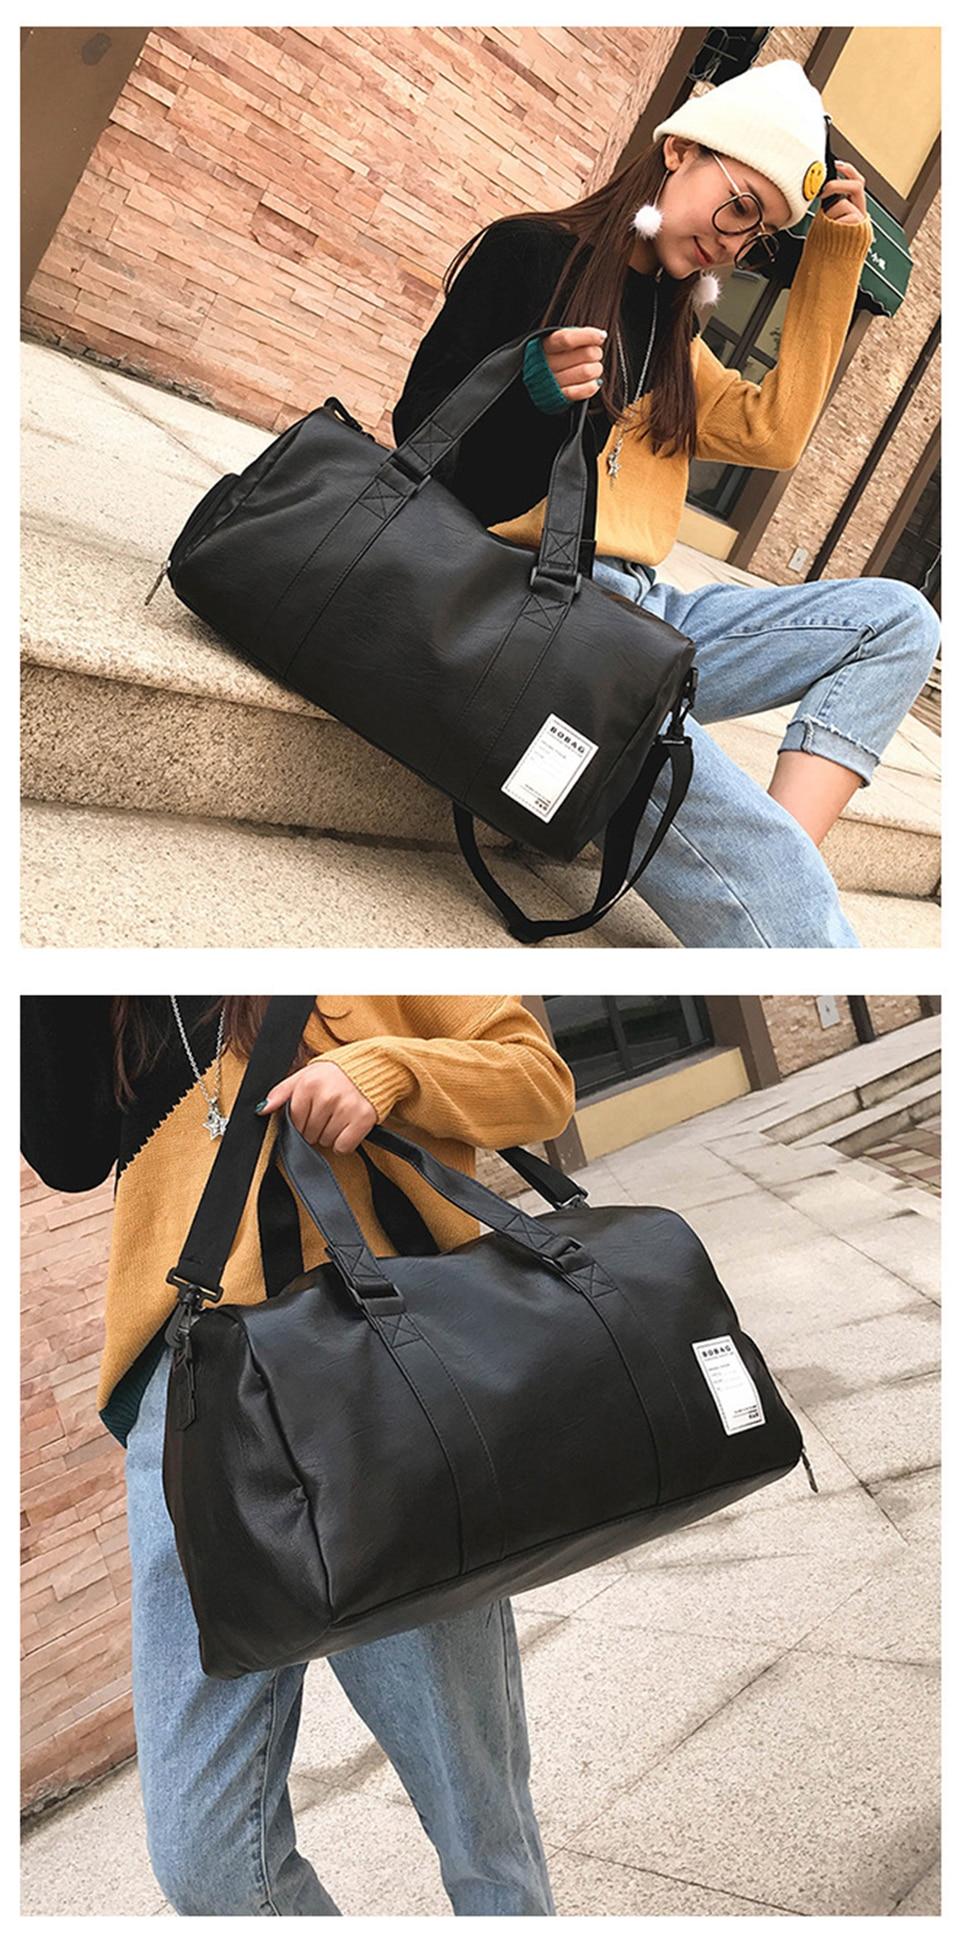 Travel-Bag-Overnight-Womens-Mens-Bags-Weekend-Hand-Shoulder-Duffle-Bag-Traveling-Sports-Gym-Girls-Short-Trip-Big-Large-Bolsas_09